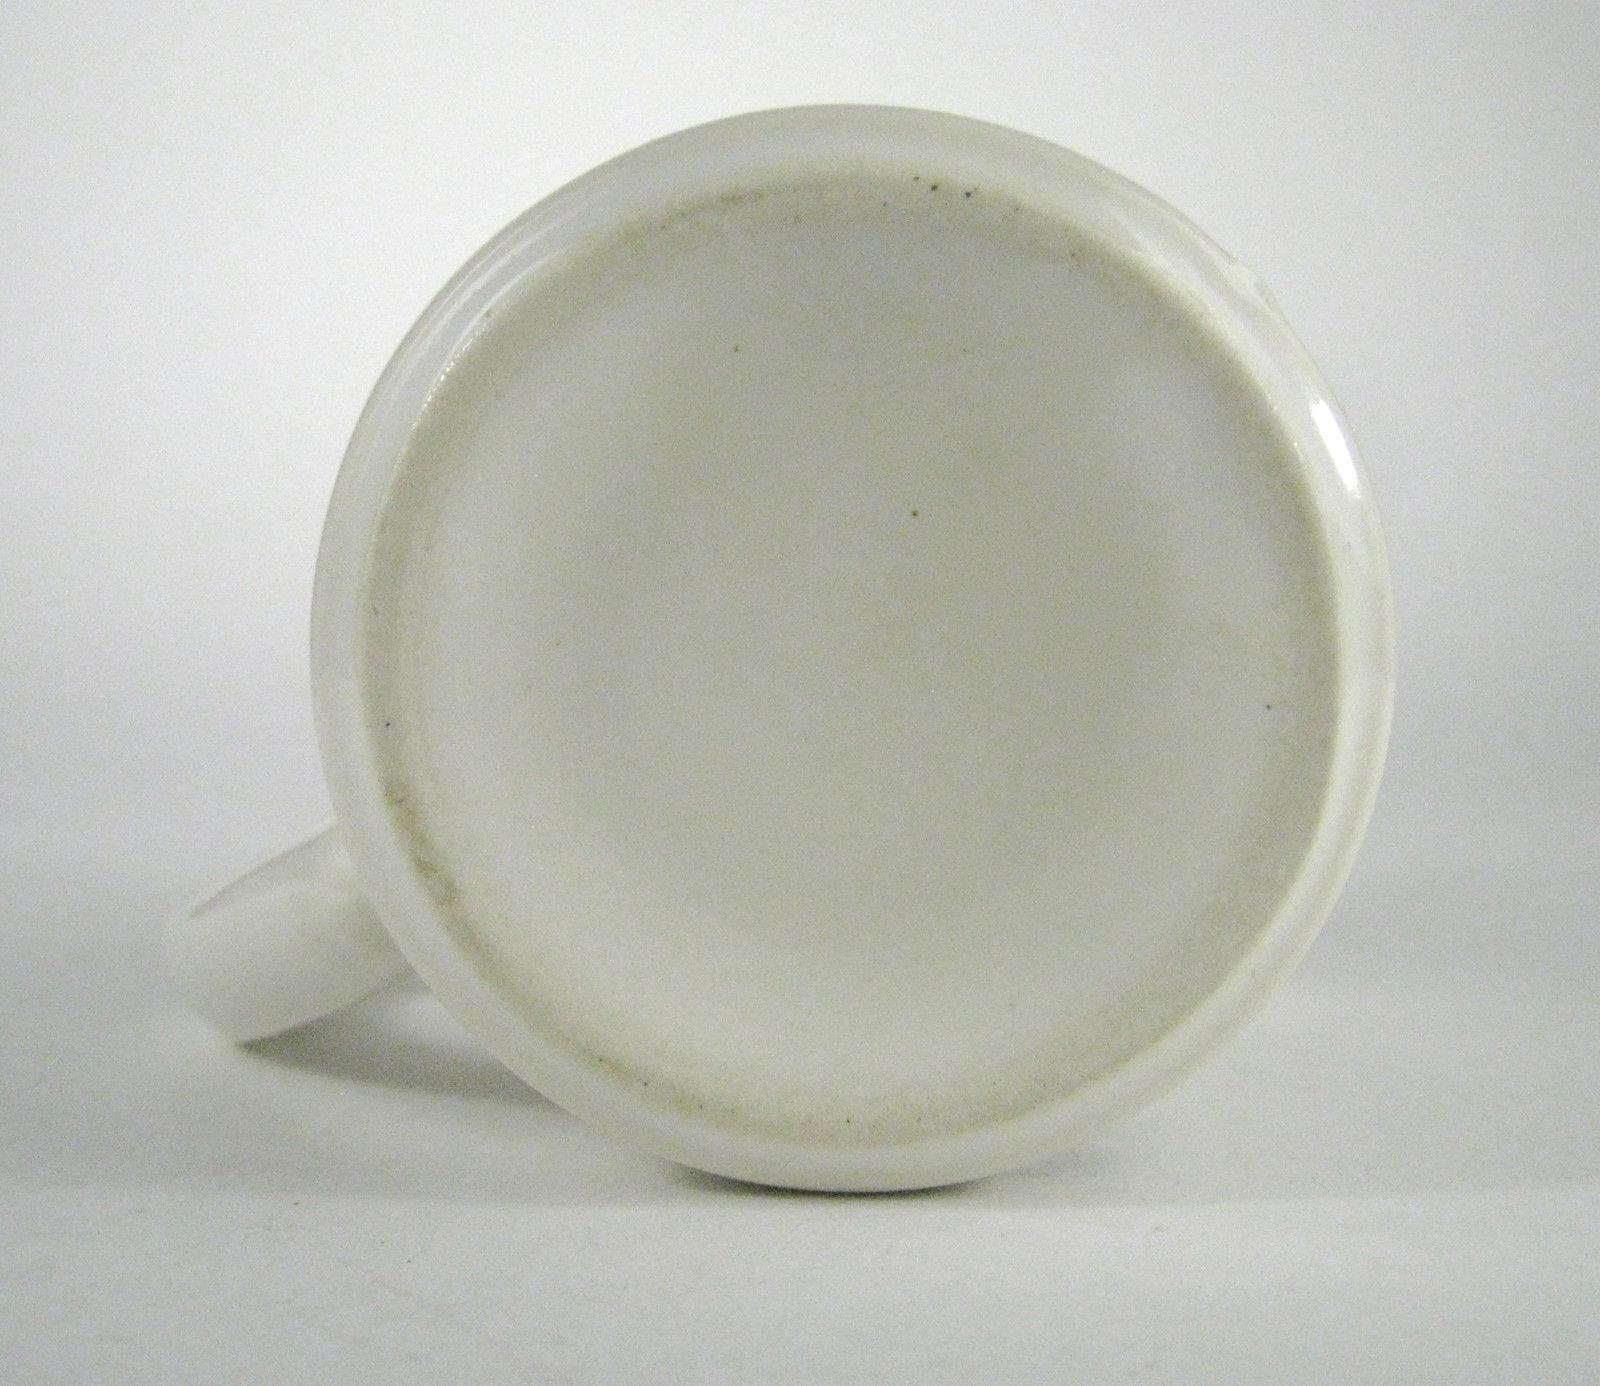 Atlantic City New Jersey Gambling Casino Coffee Tea Mug Cup White NJ Dice Die